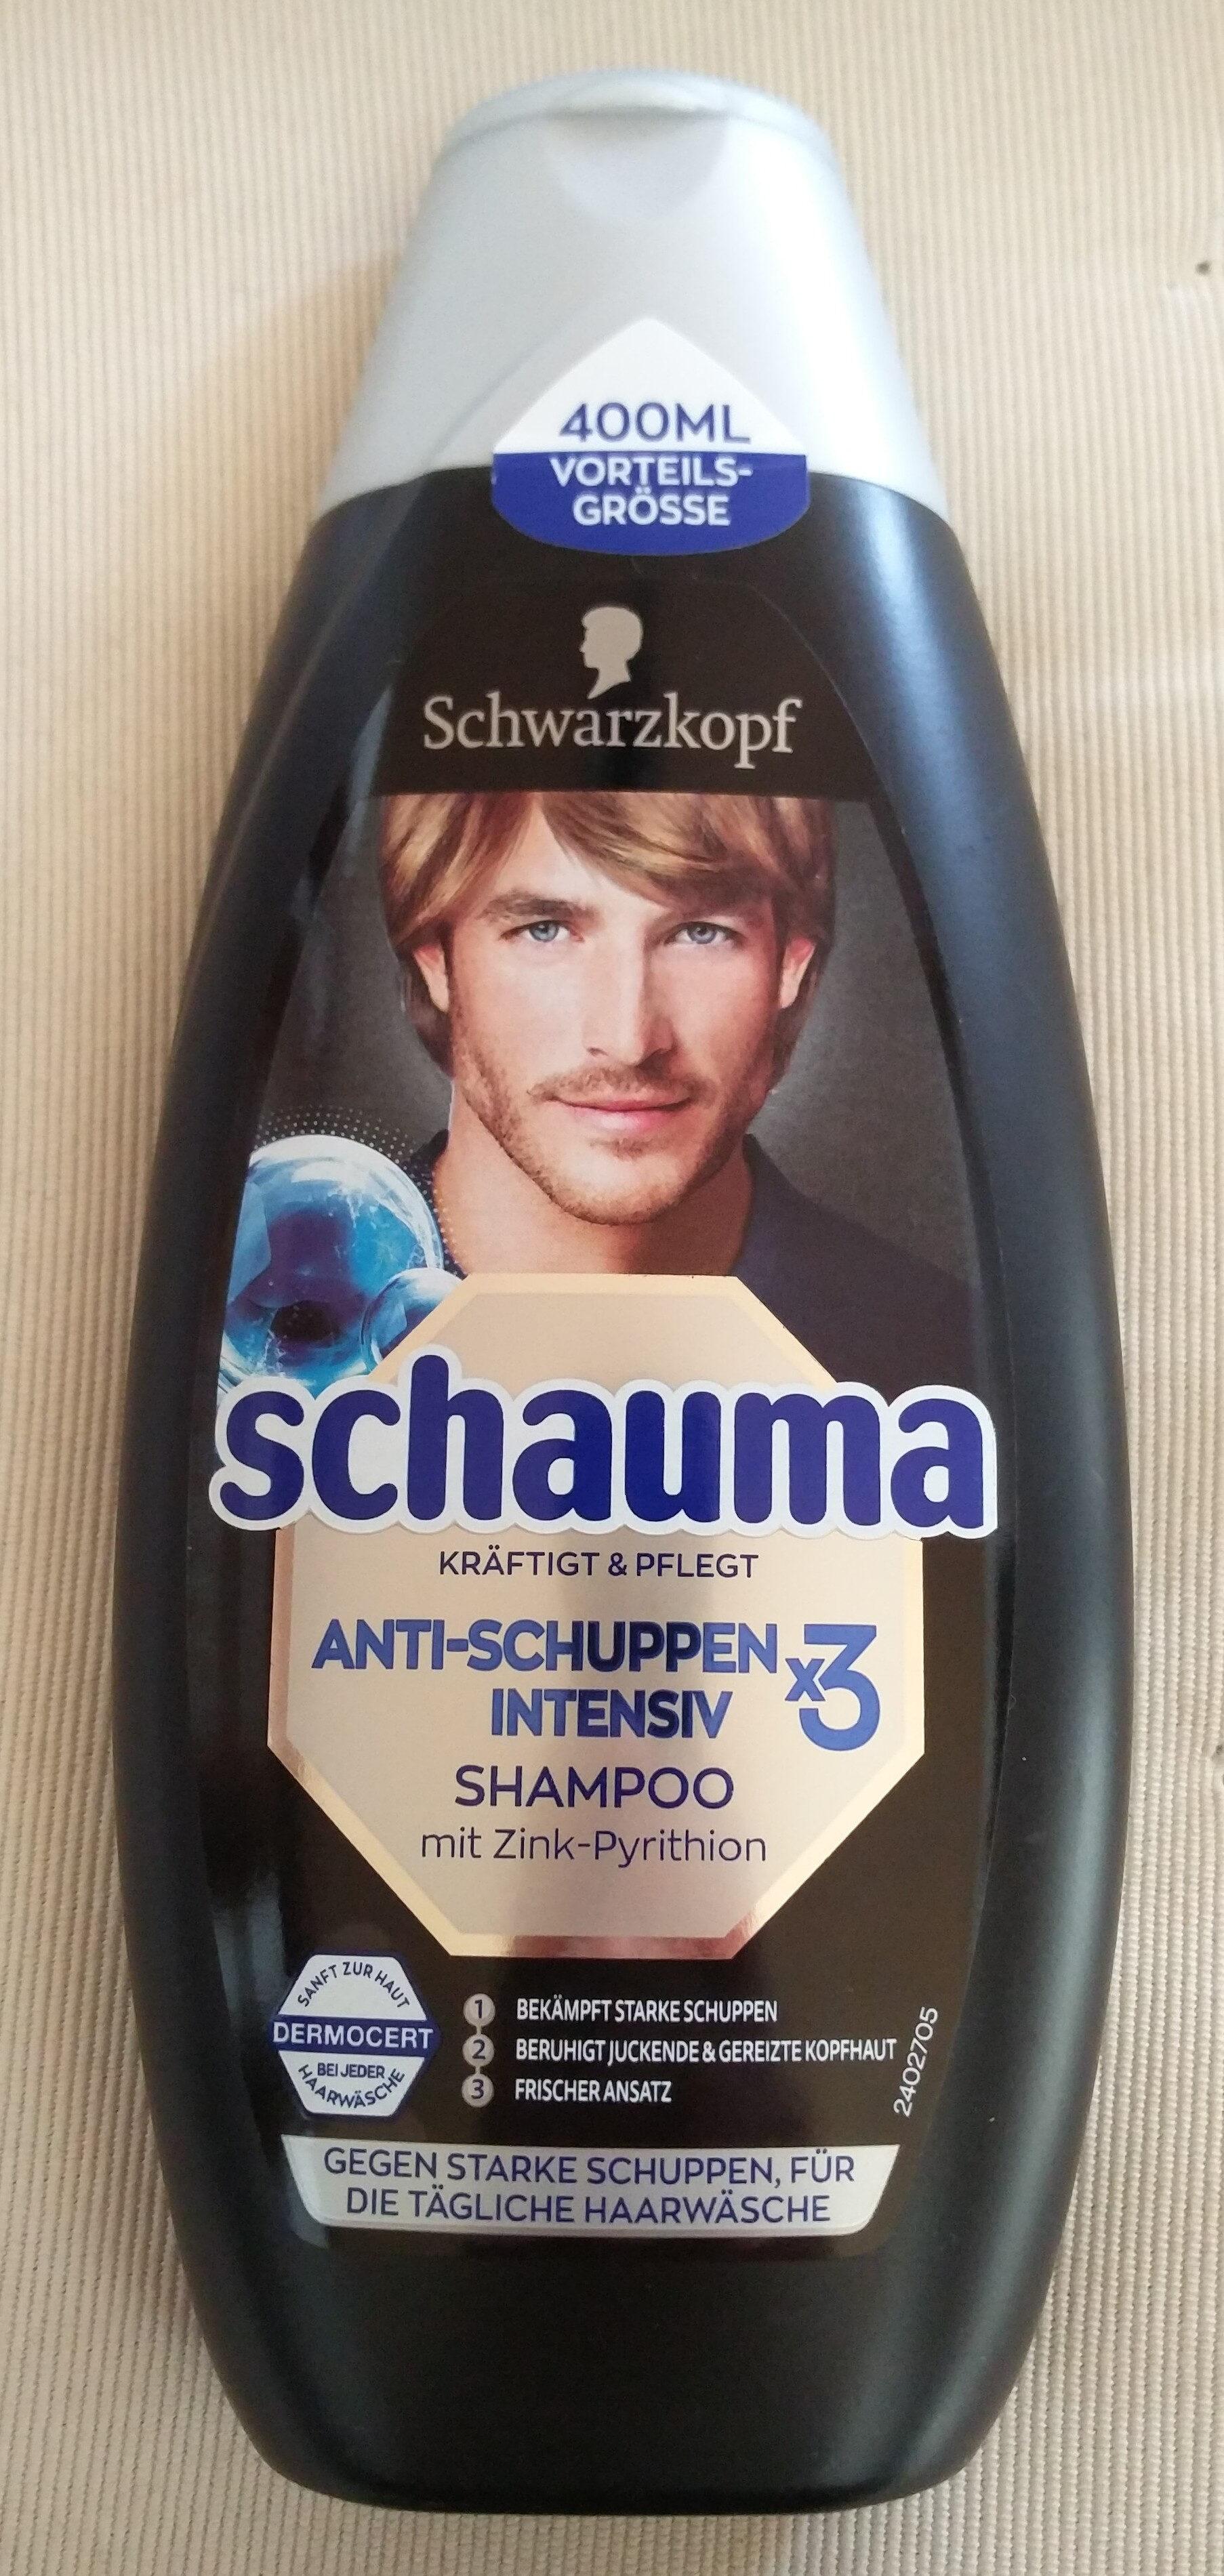 Anti-Schuppen Intensiv Shampoo (x3, mit Zink-Pyrithion) - Produit - de